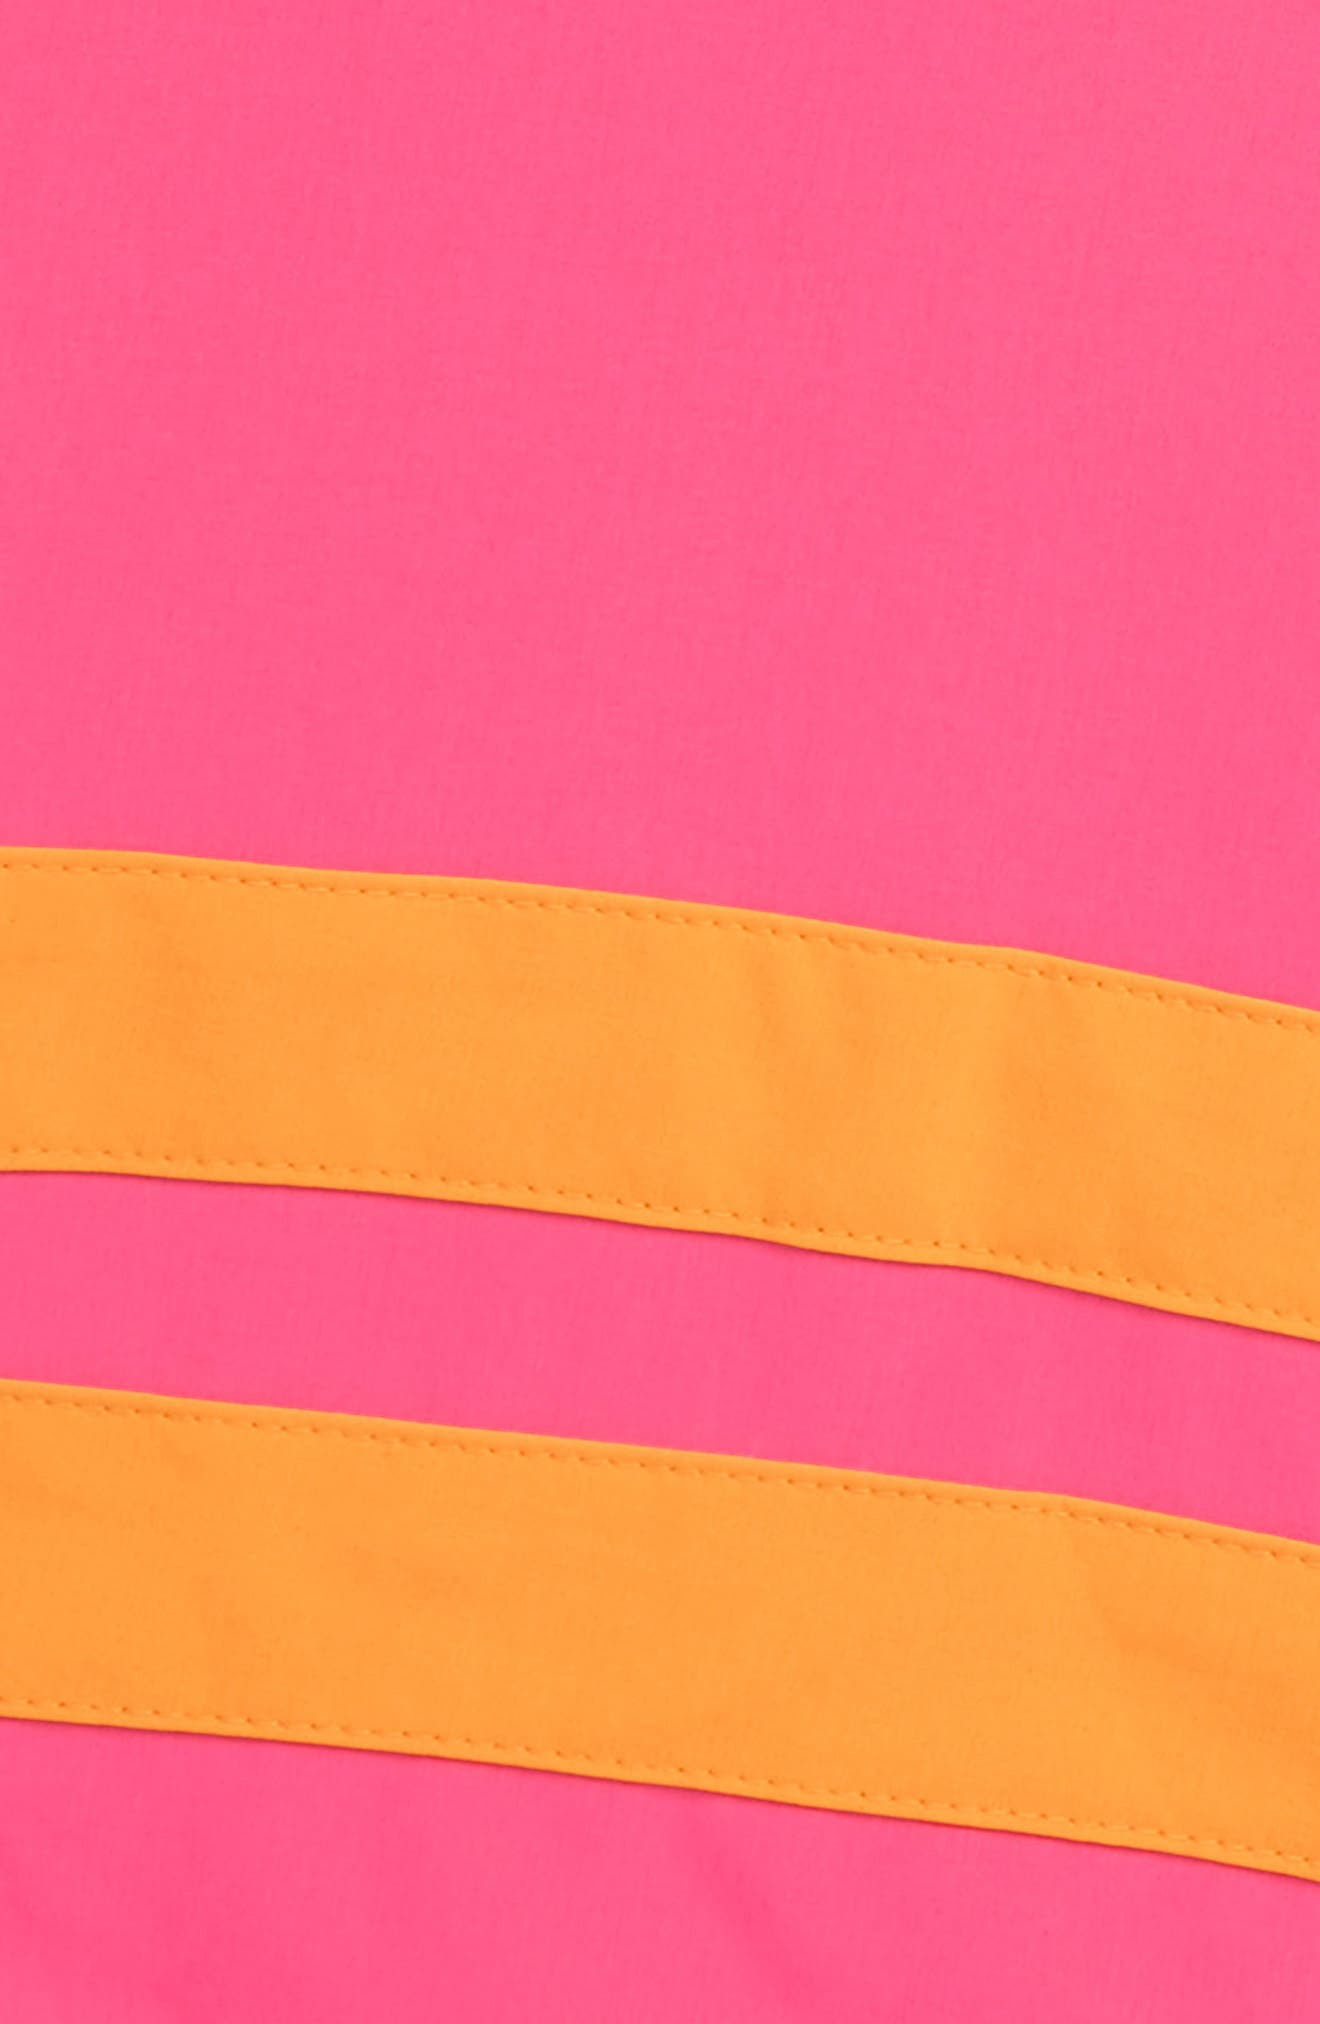 HURLEY, Phantom Block Party Board Shorts, Alternate thumbnail 2, color, HYPER PINK